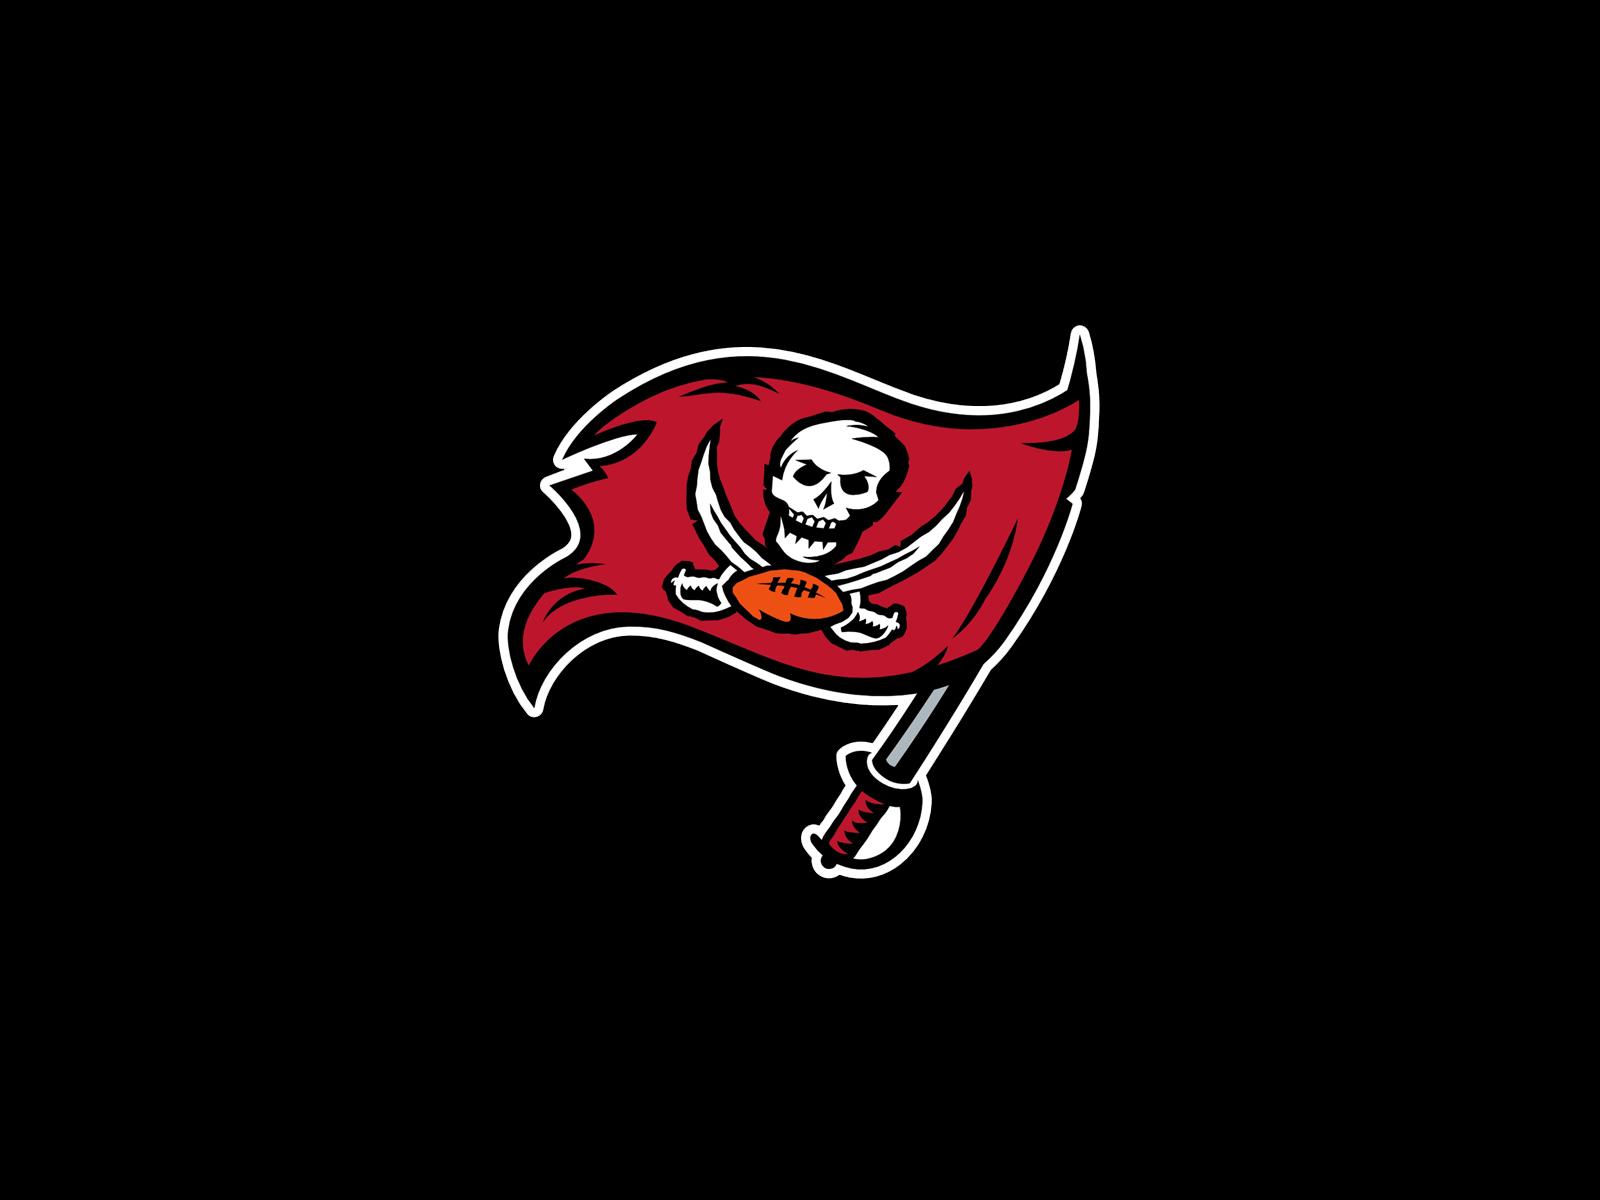 Tampa bay buccaneers gangbang 3